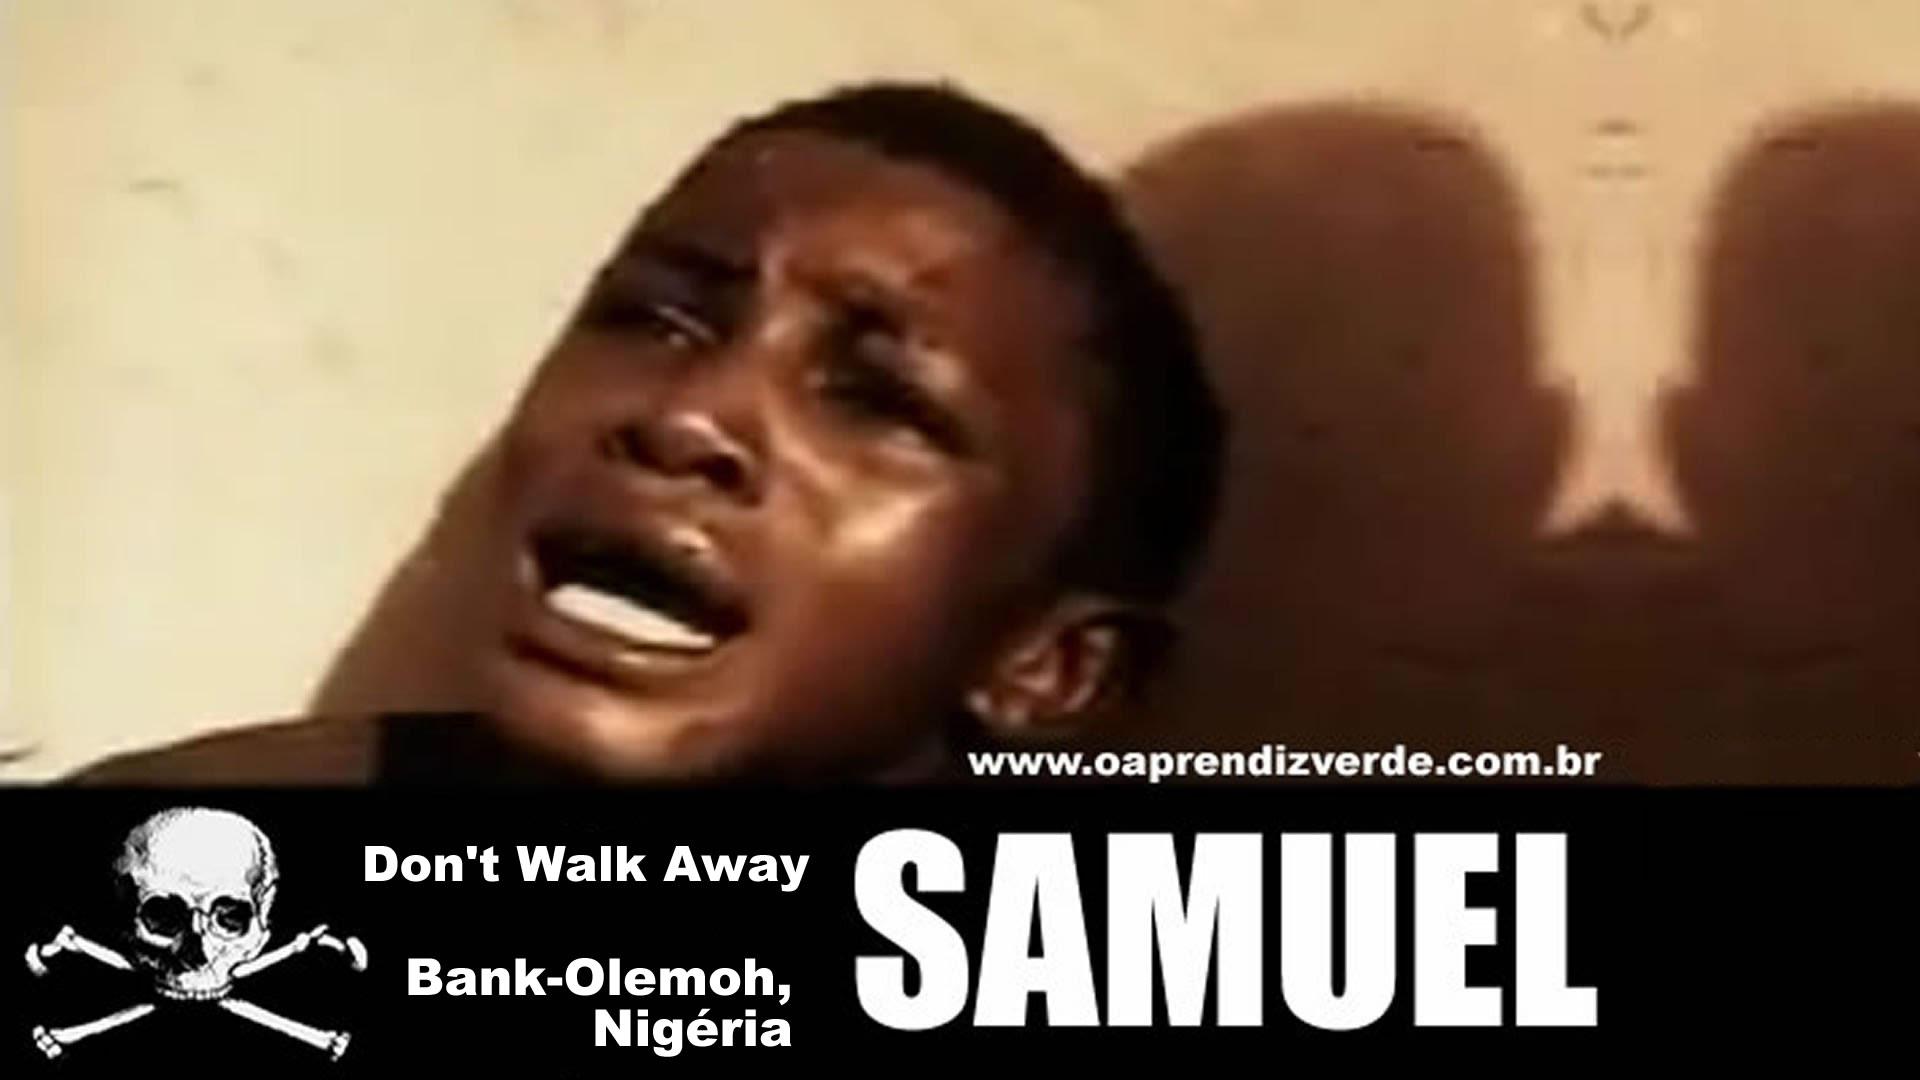 Notorios e Horripilantes Crimes de 2013 - Samuel